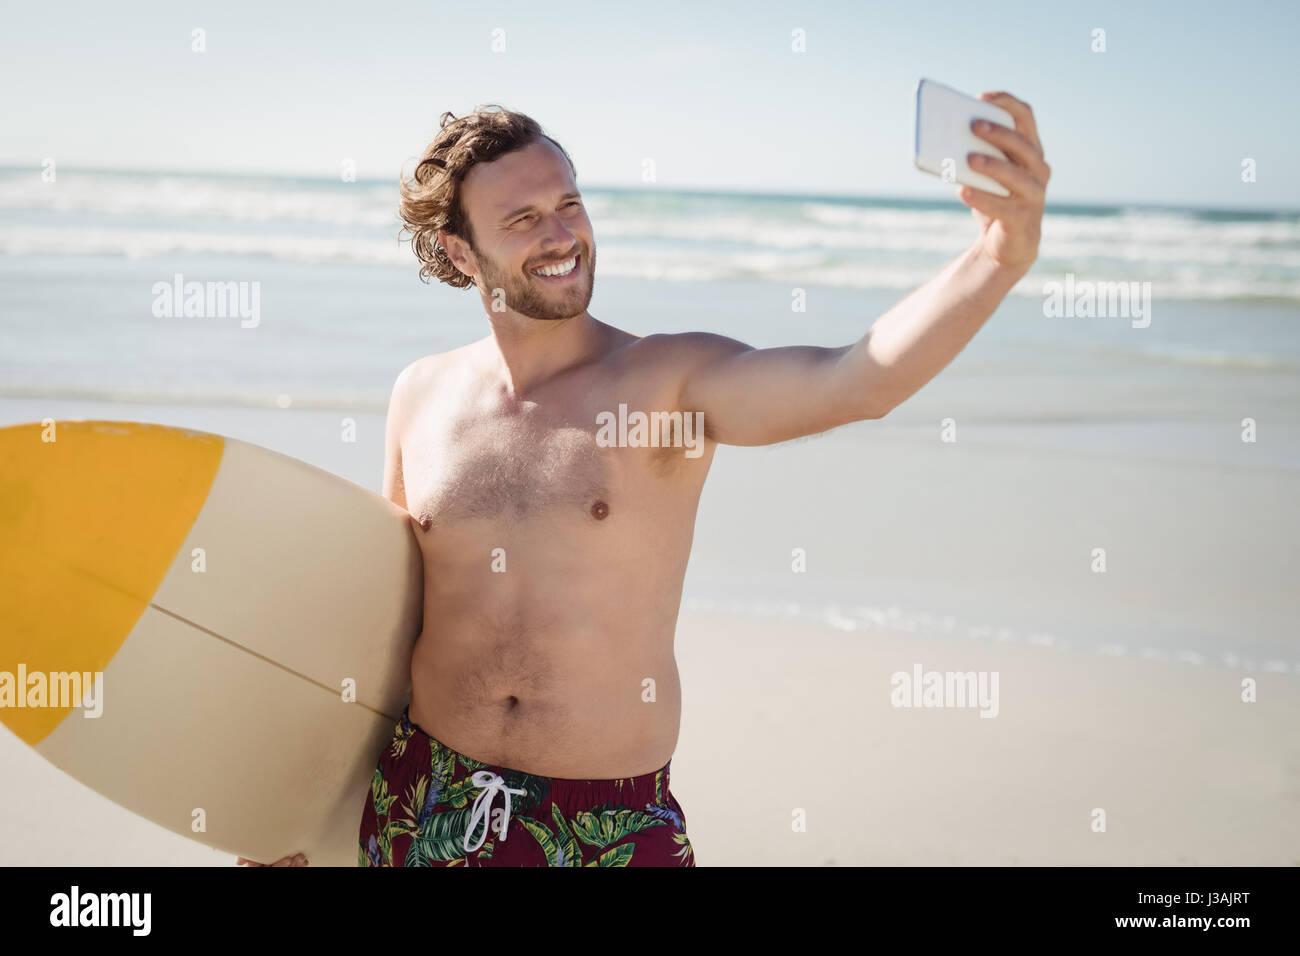 Nackt strand selfie